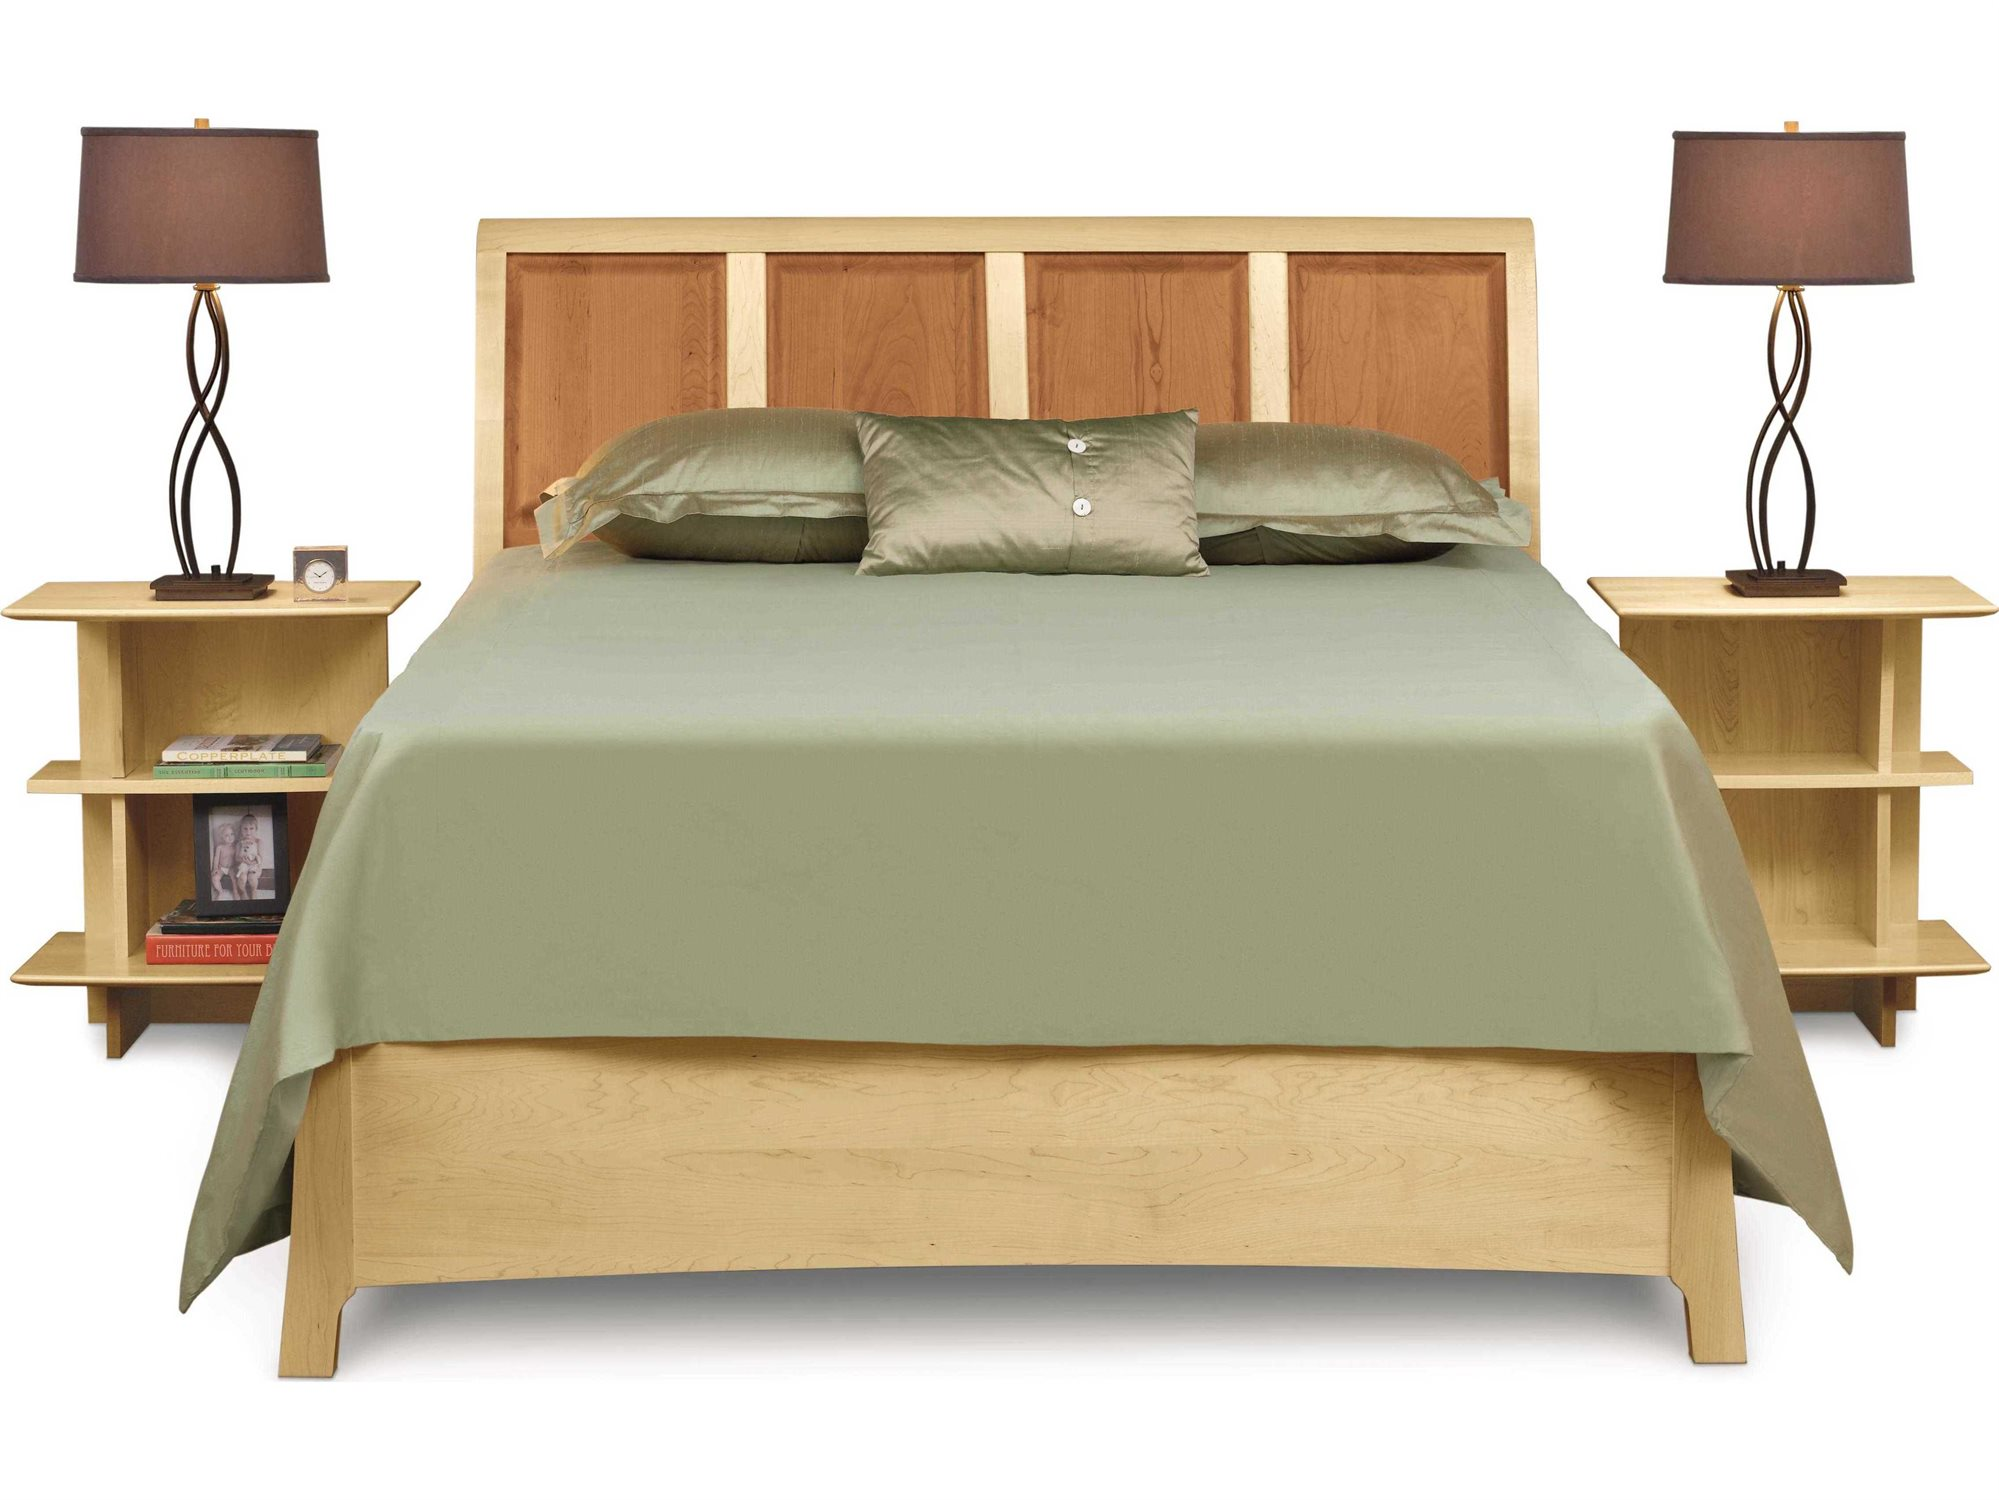 Copeland Furniture Sarah Sleigh Bed With Storage